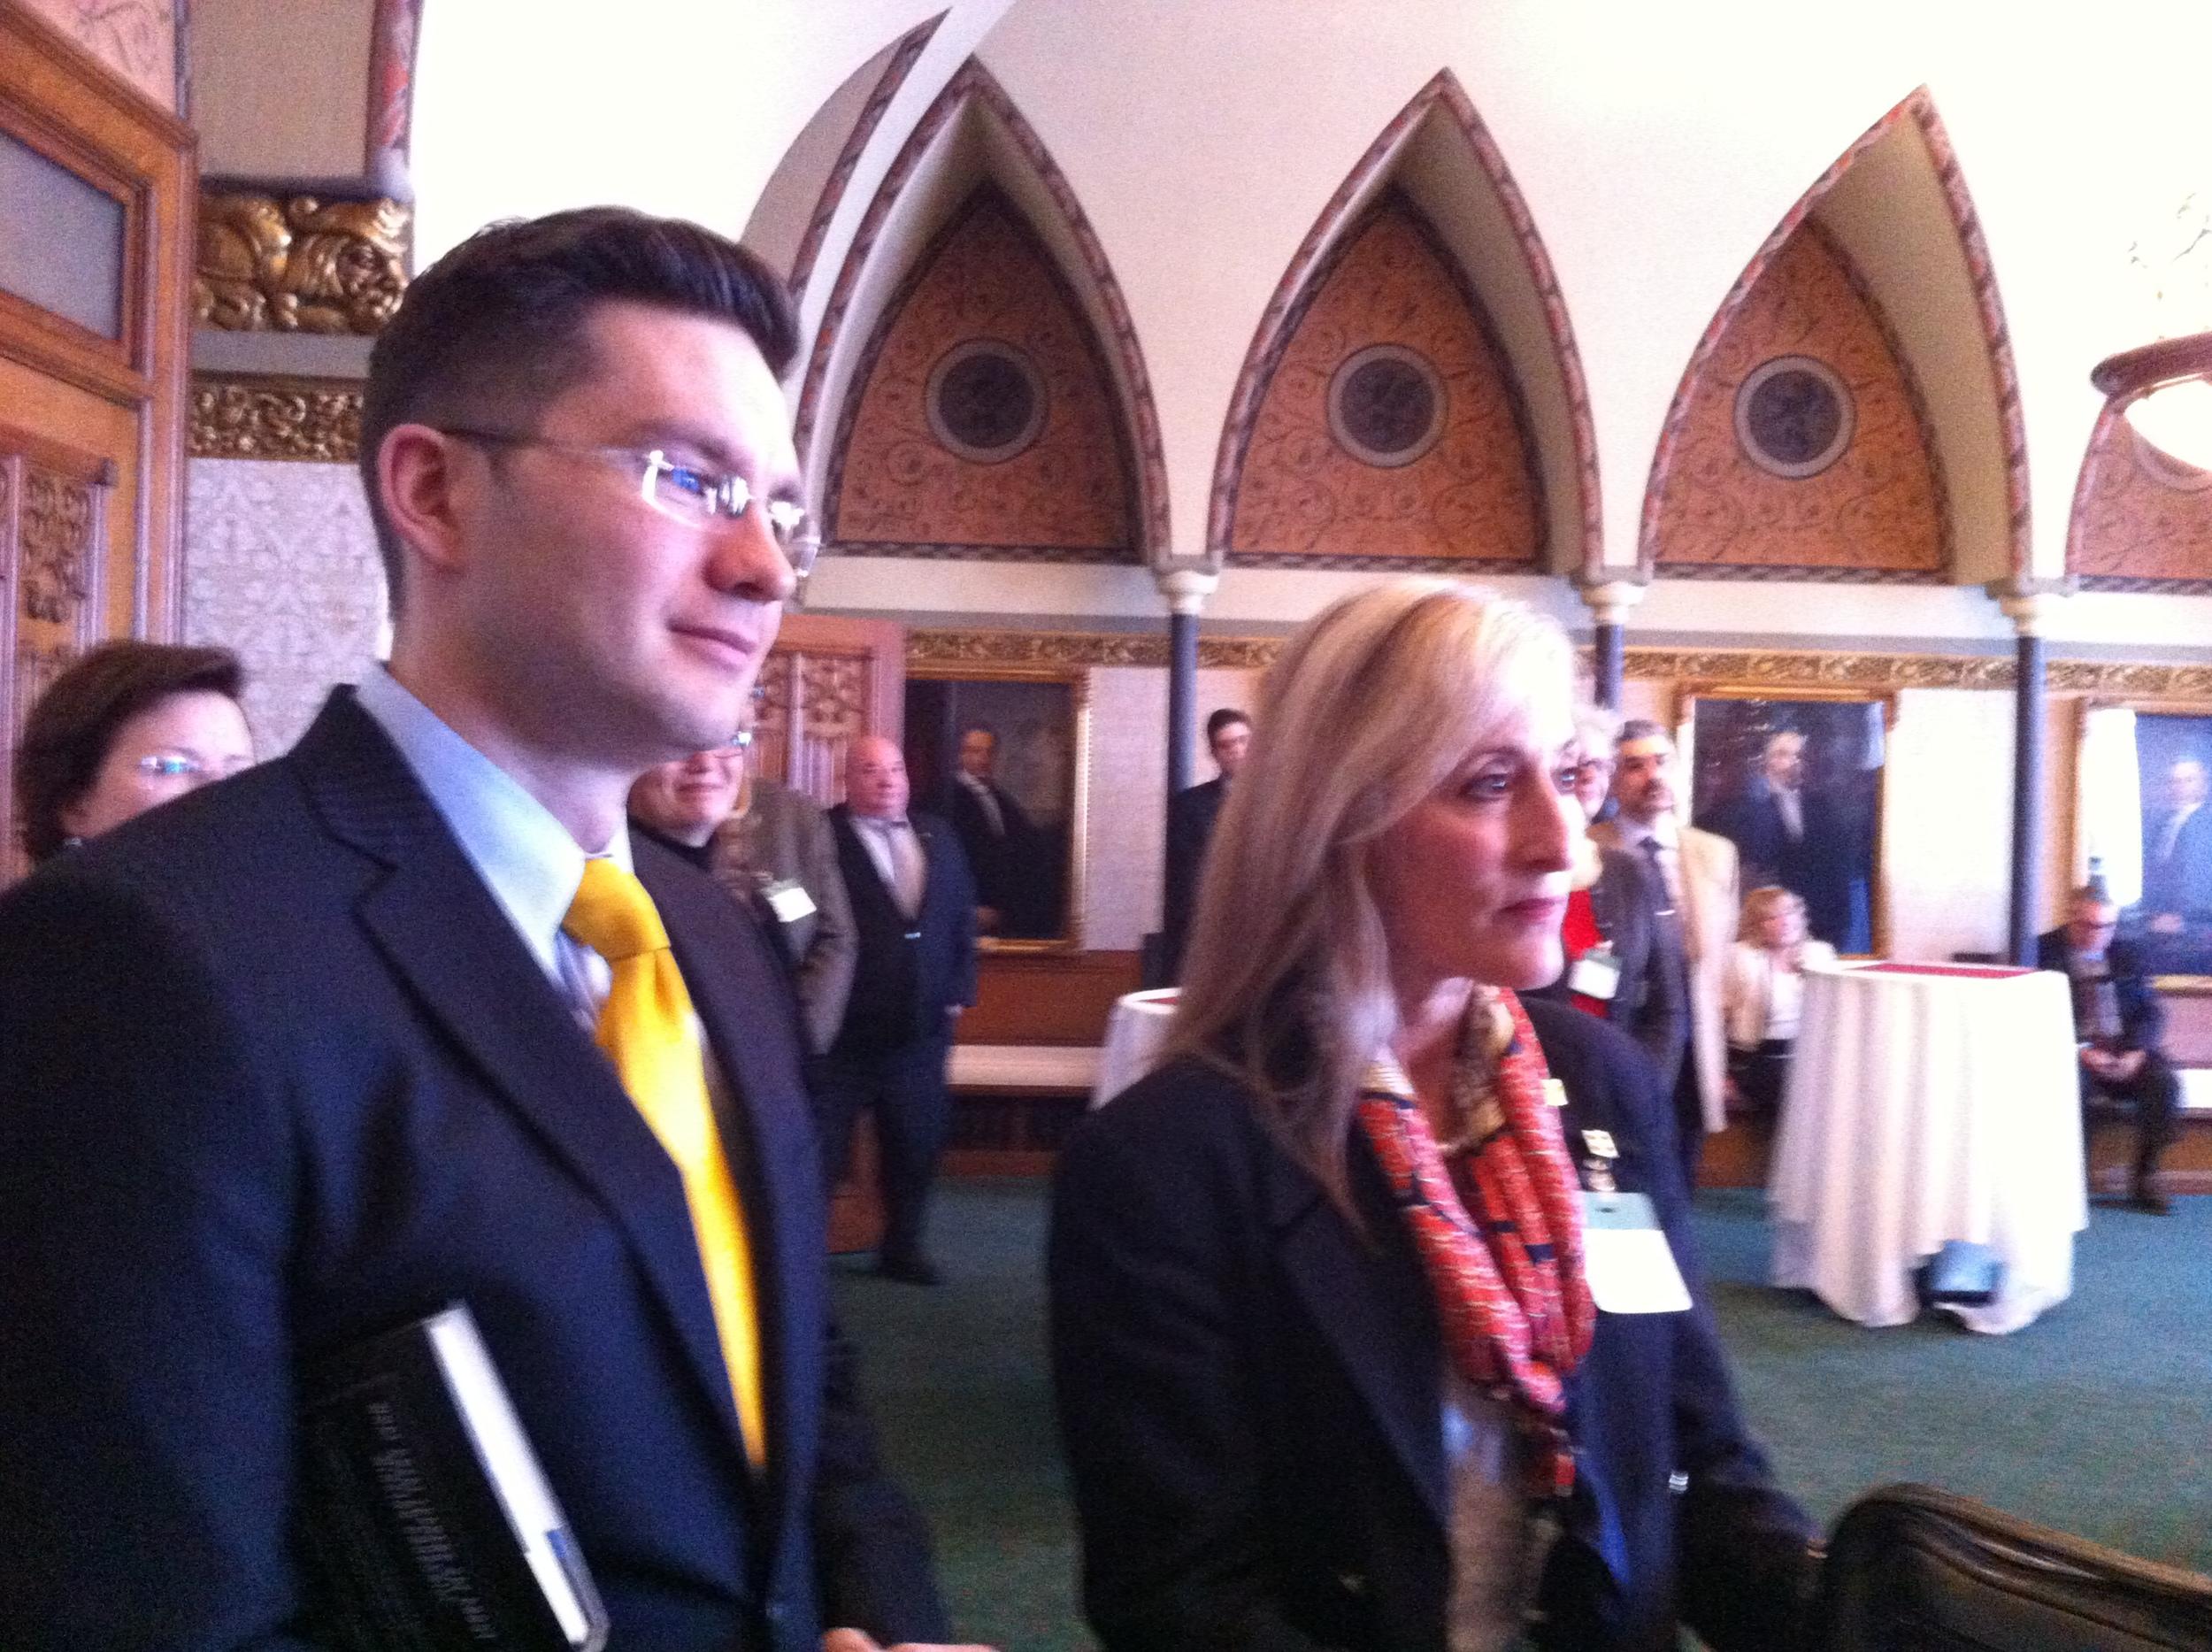 Minister Pierre Poilievre, M.P., and SWCSO member Floralove Katz